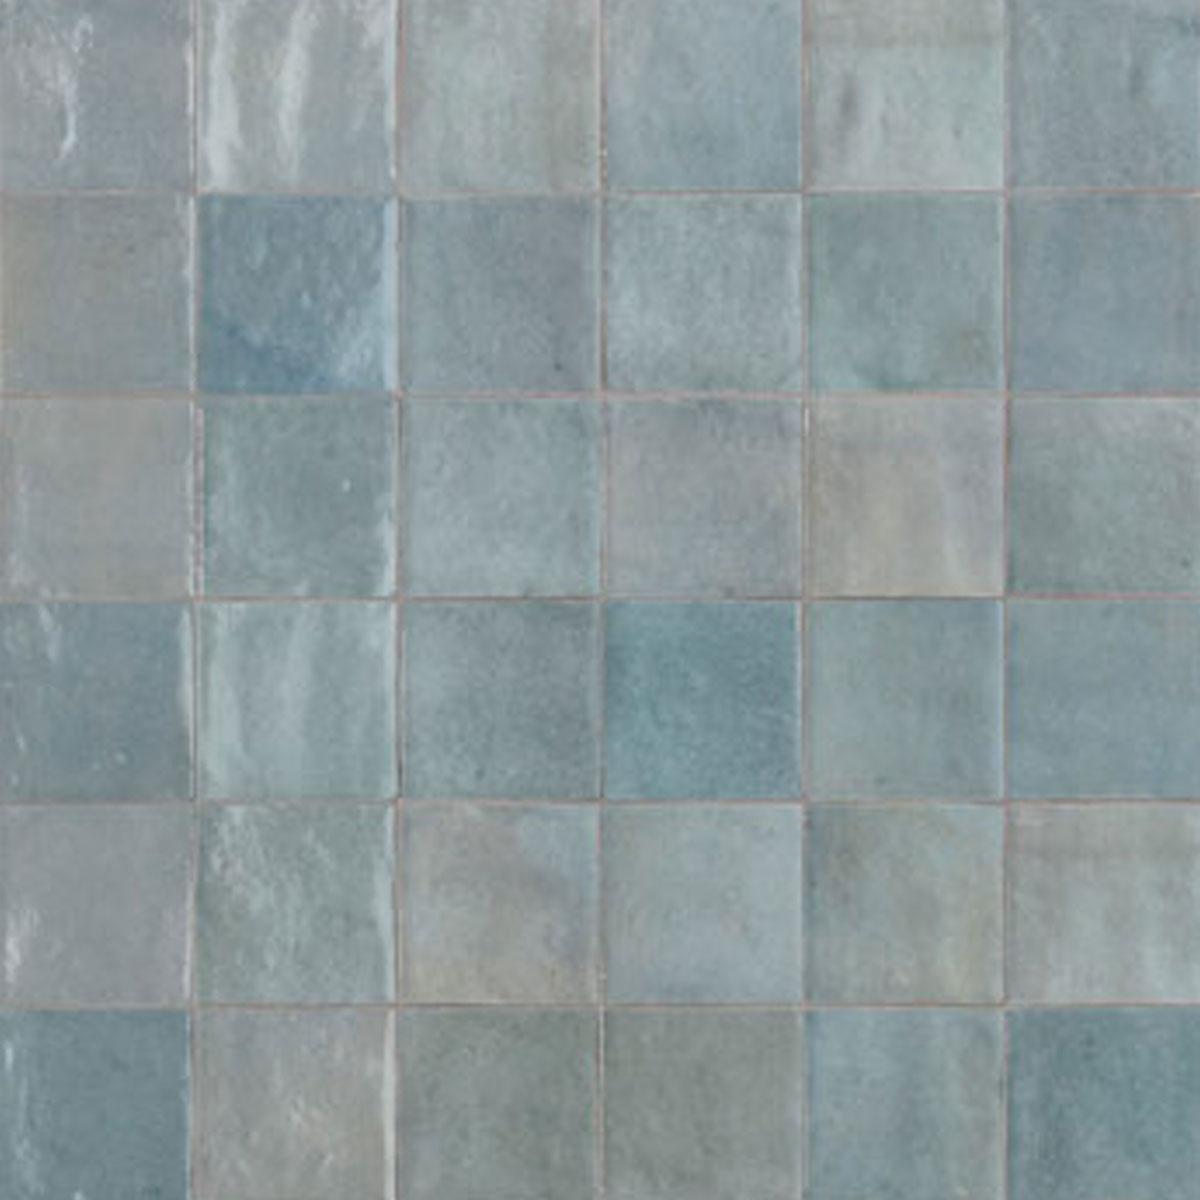 Zellige - Cielo - Handmade Look Tiles - Stone3 Brisbane